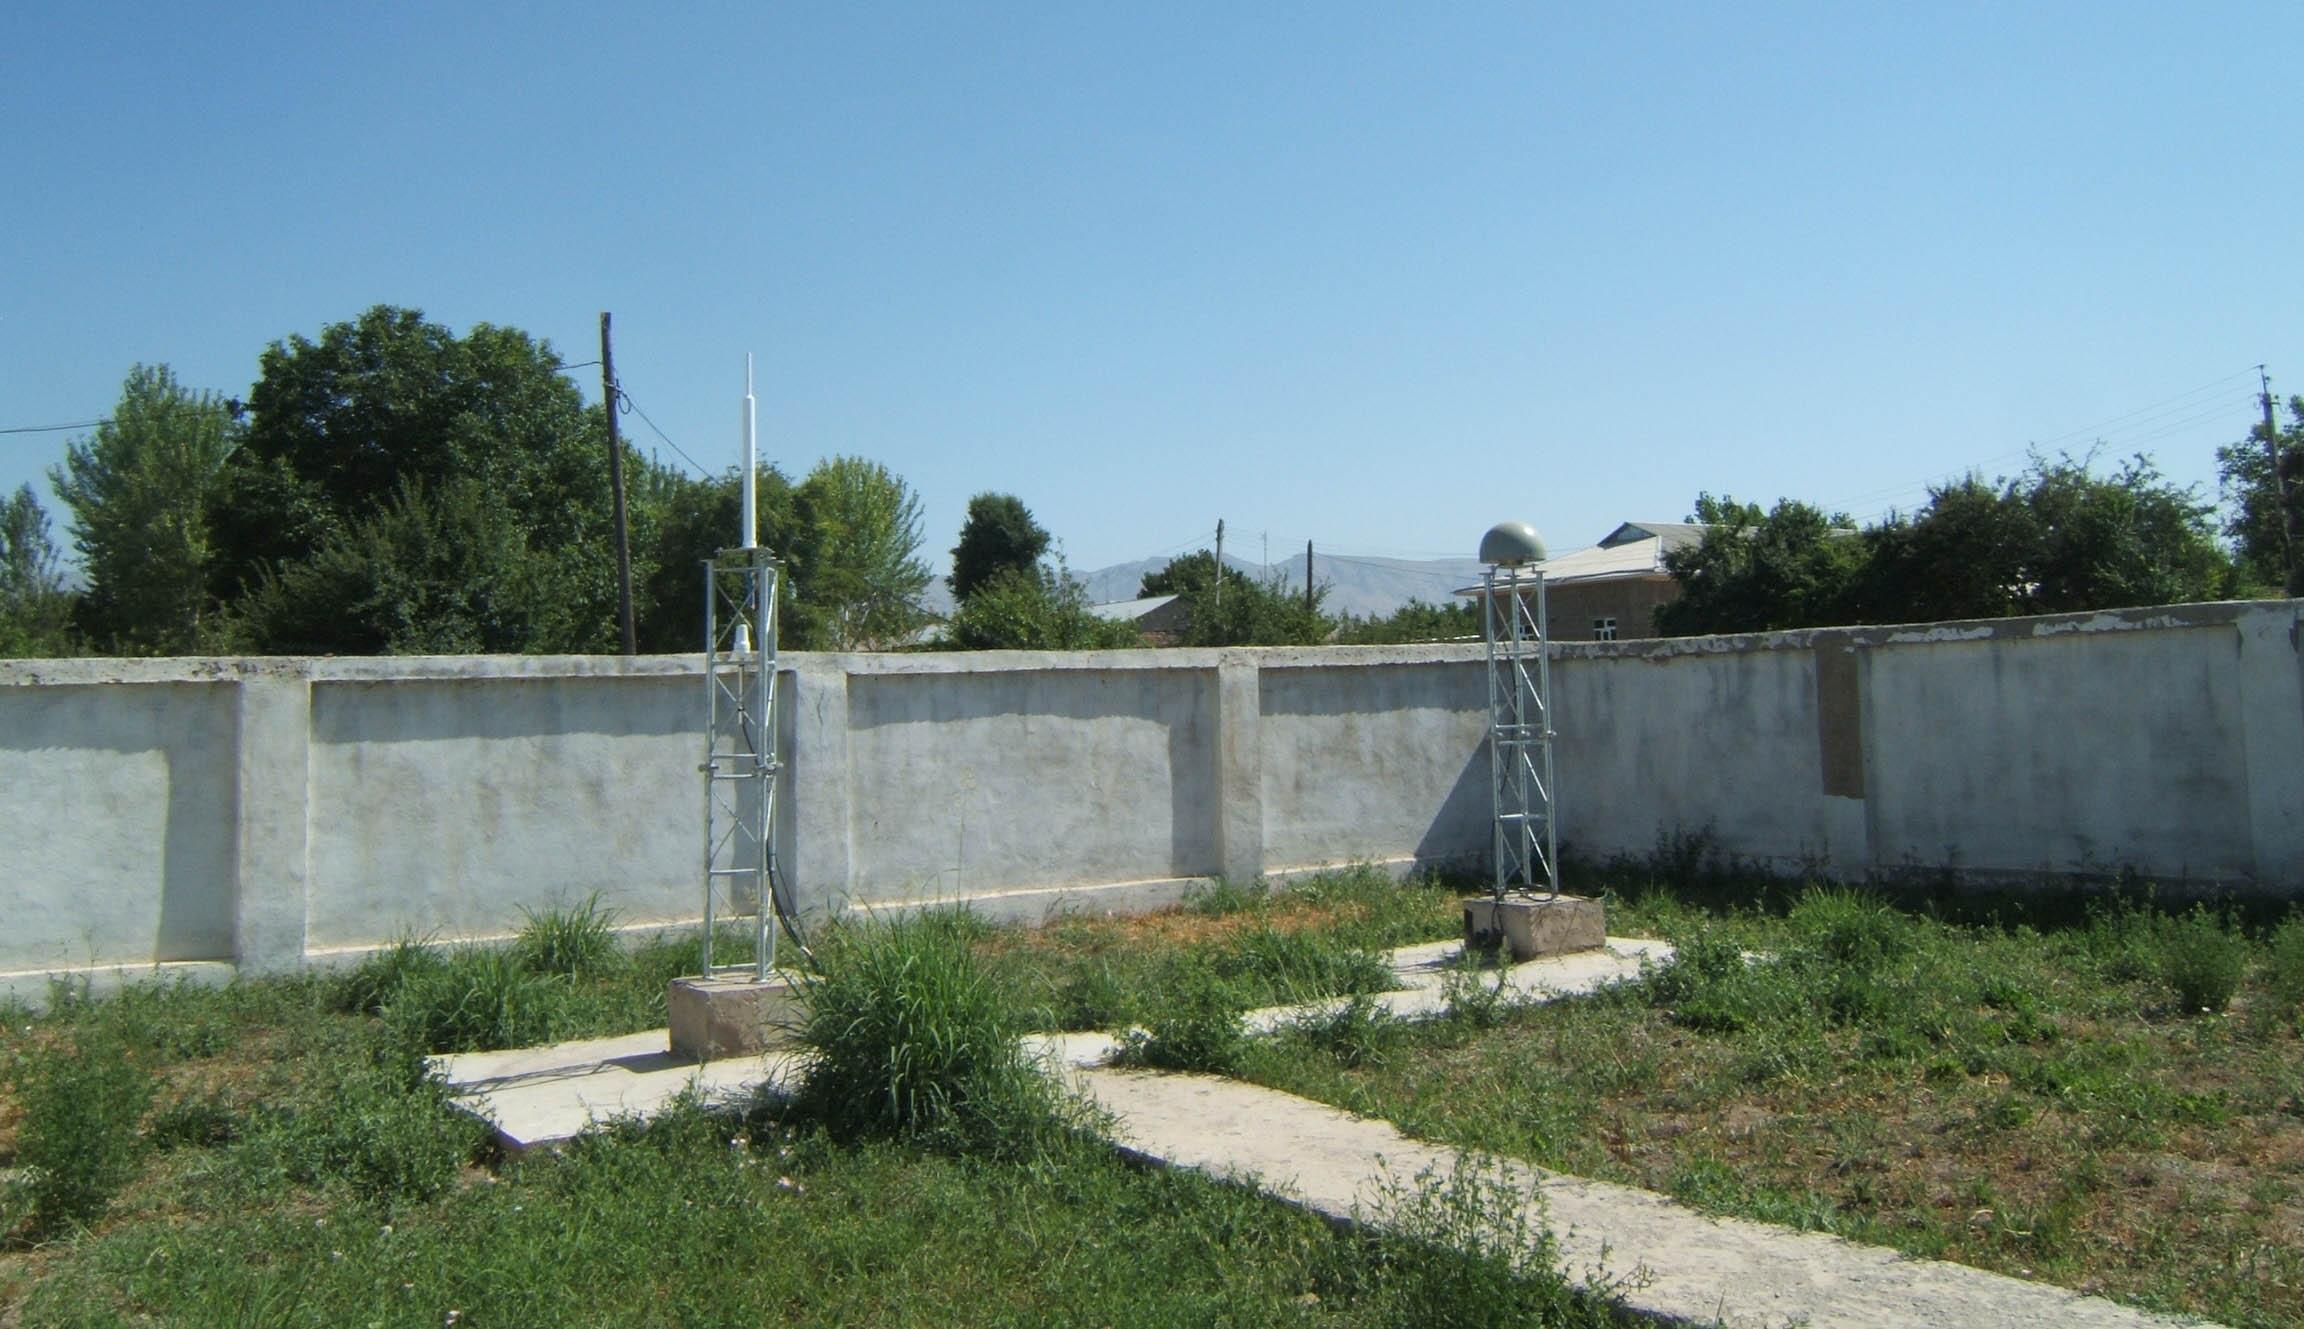 DORIS station: KITAB - UZBEKISTAN